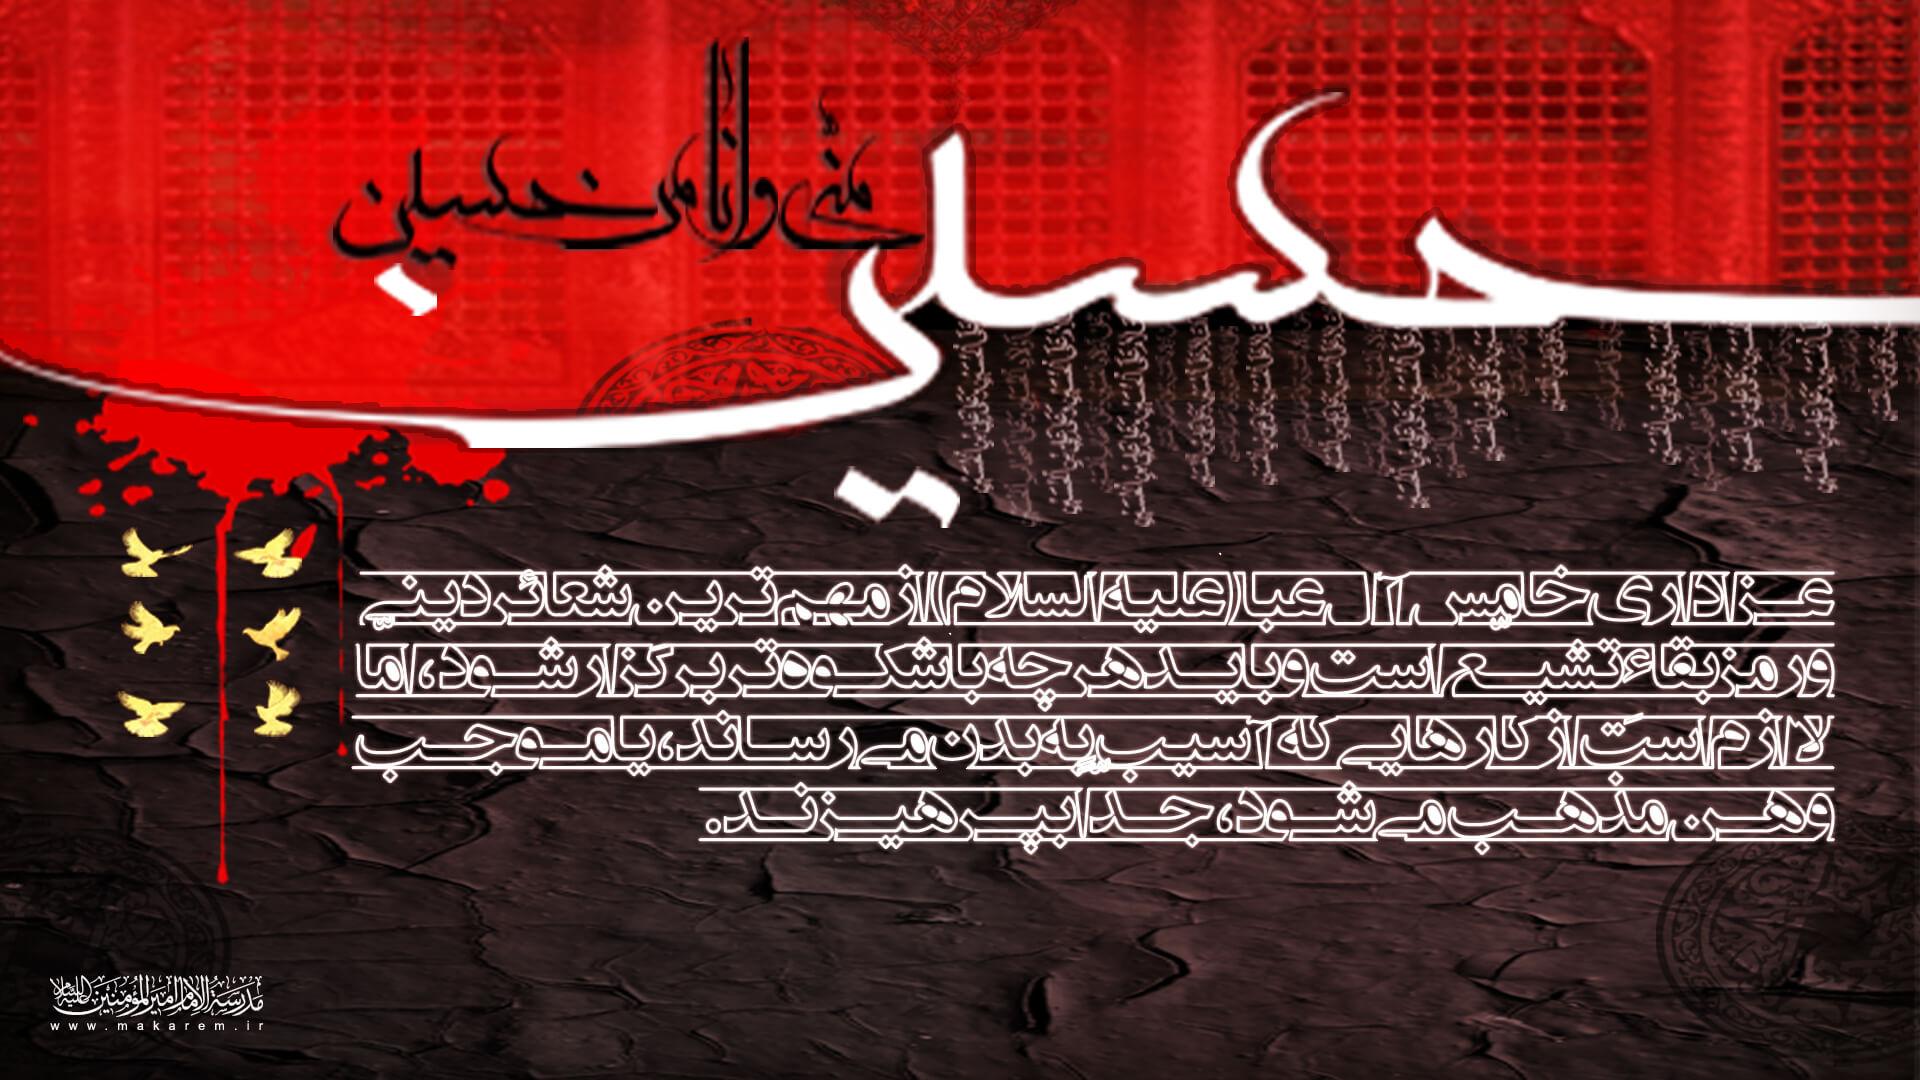 احکام عزاداری 11-مدرسه الامام امیر المومنین (ع)